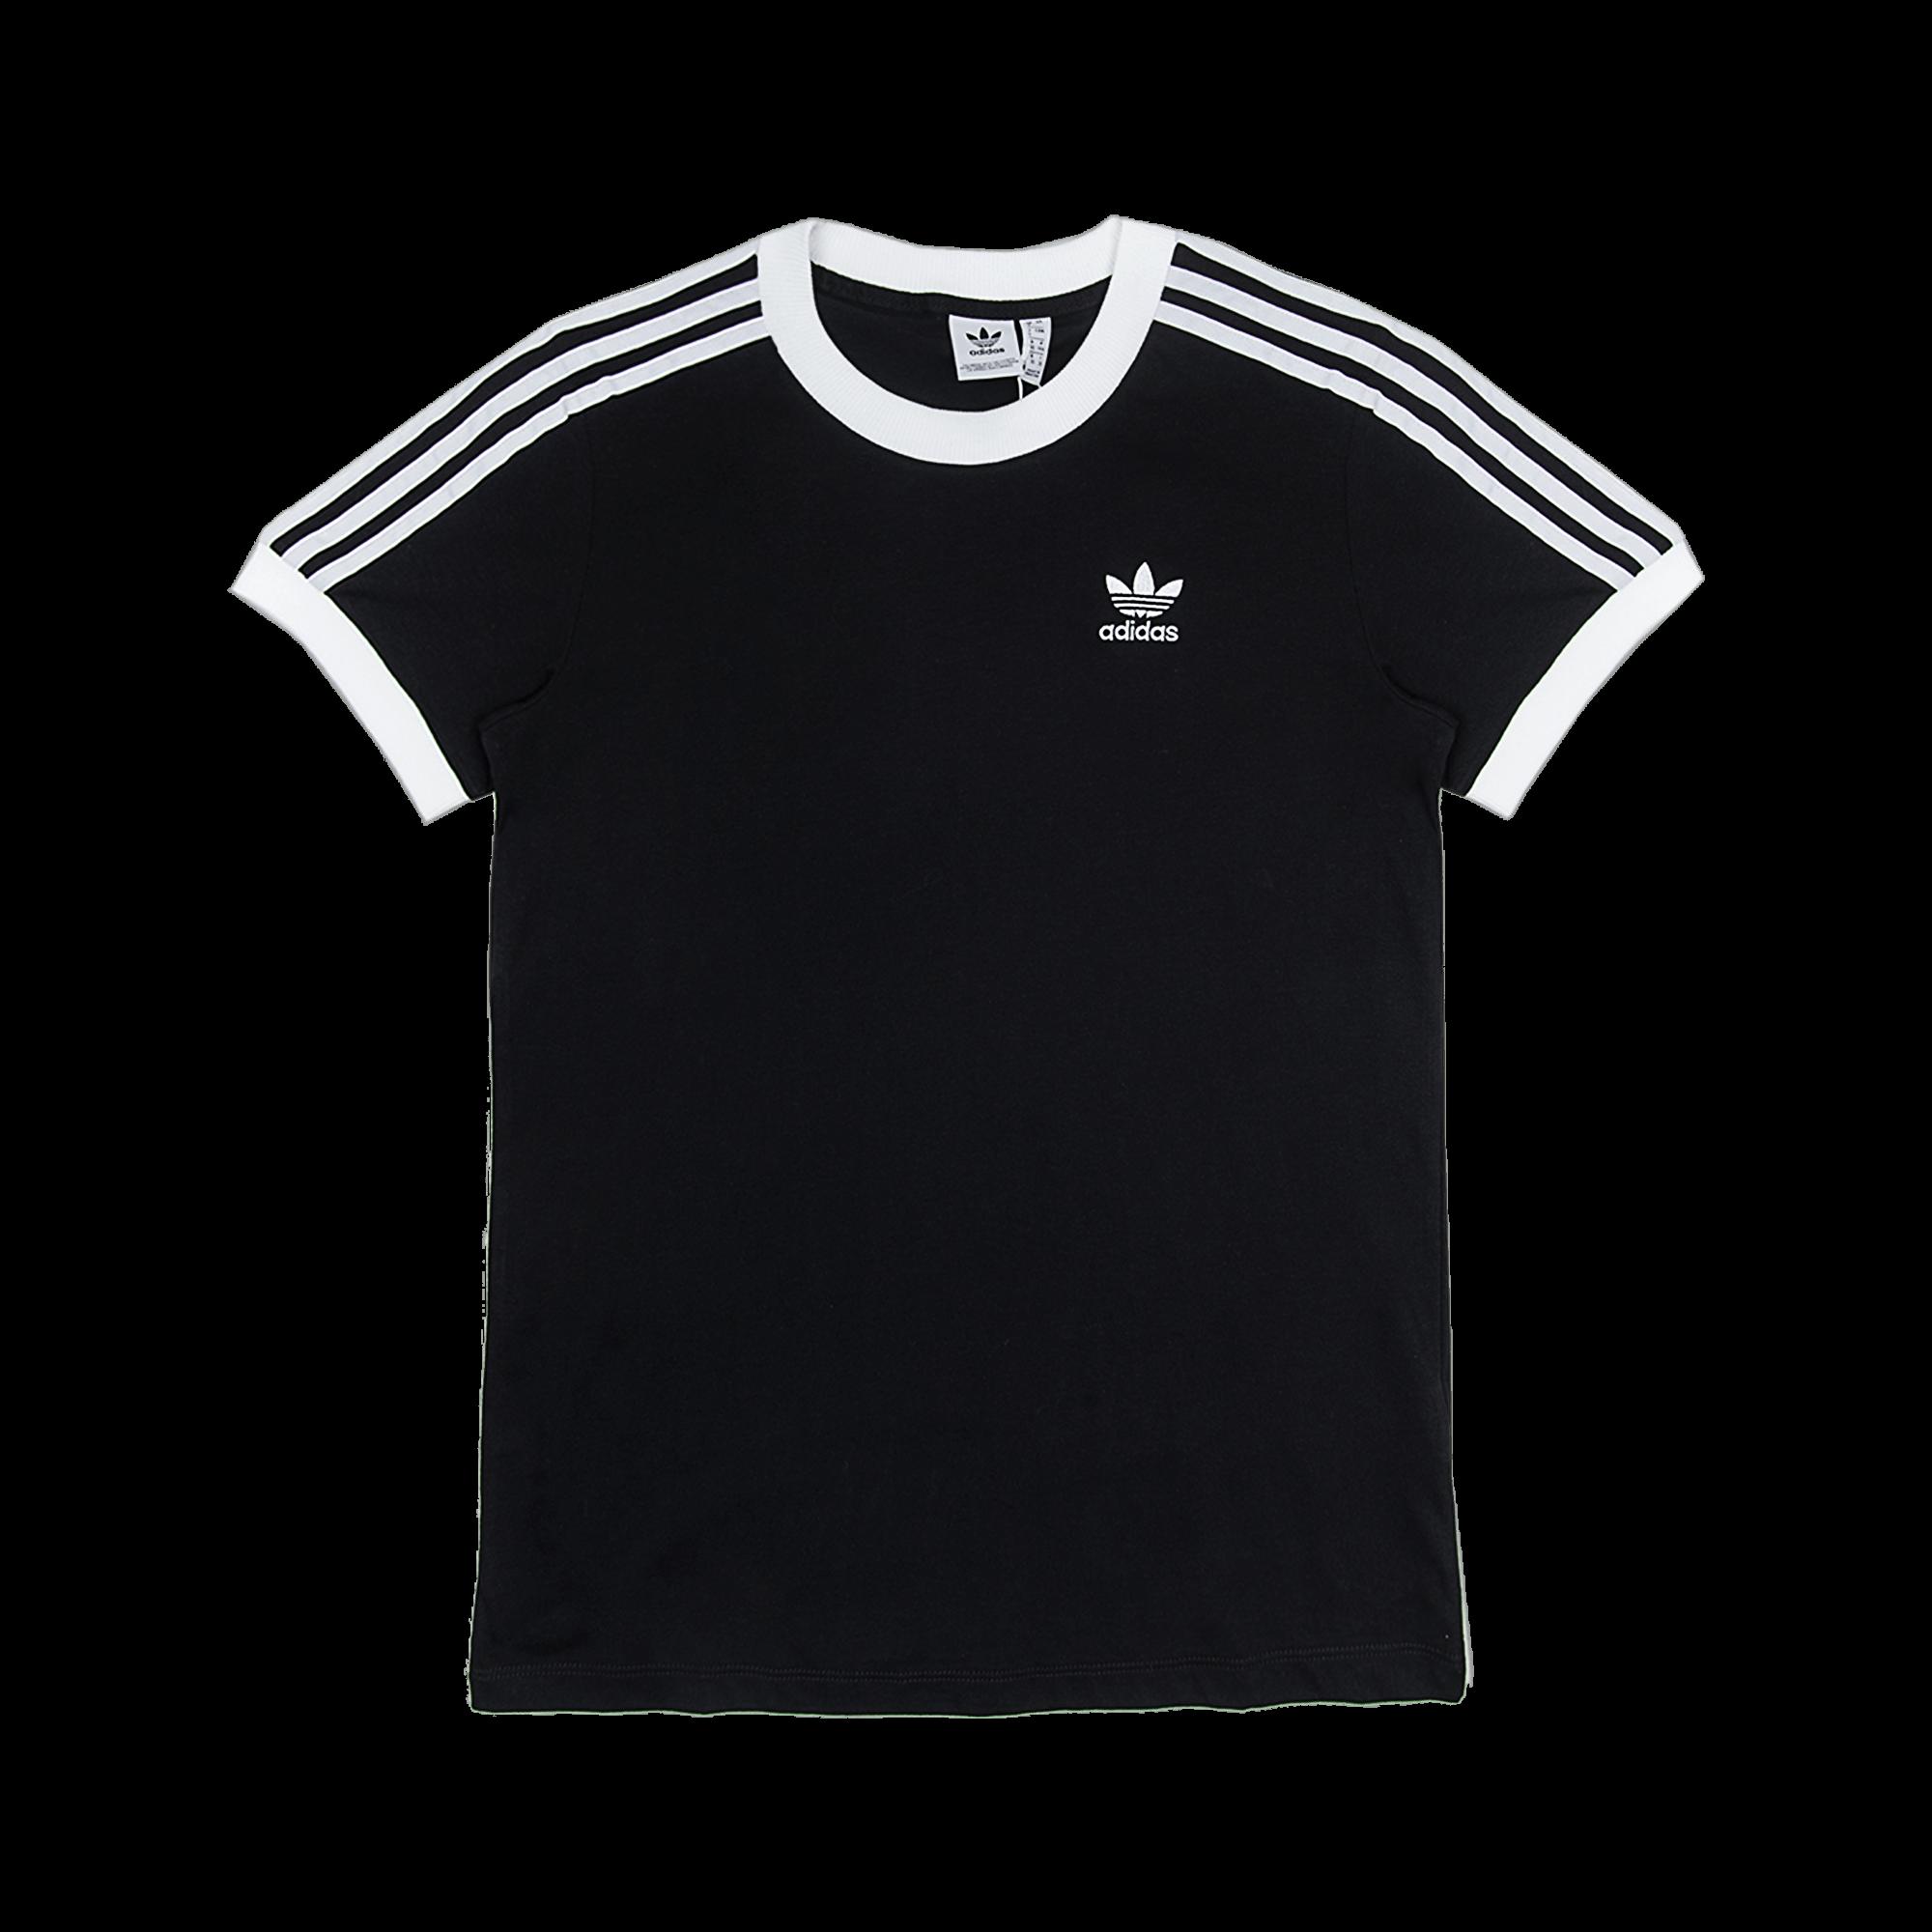 adidas 3 Stripes Tee black - T-shirt | Holypopstore.com